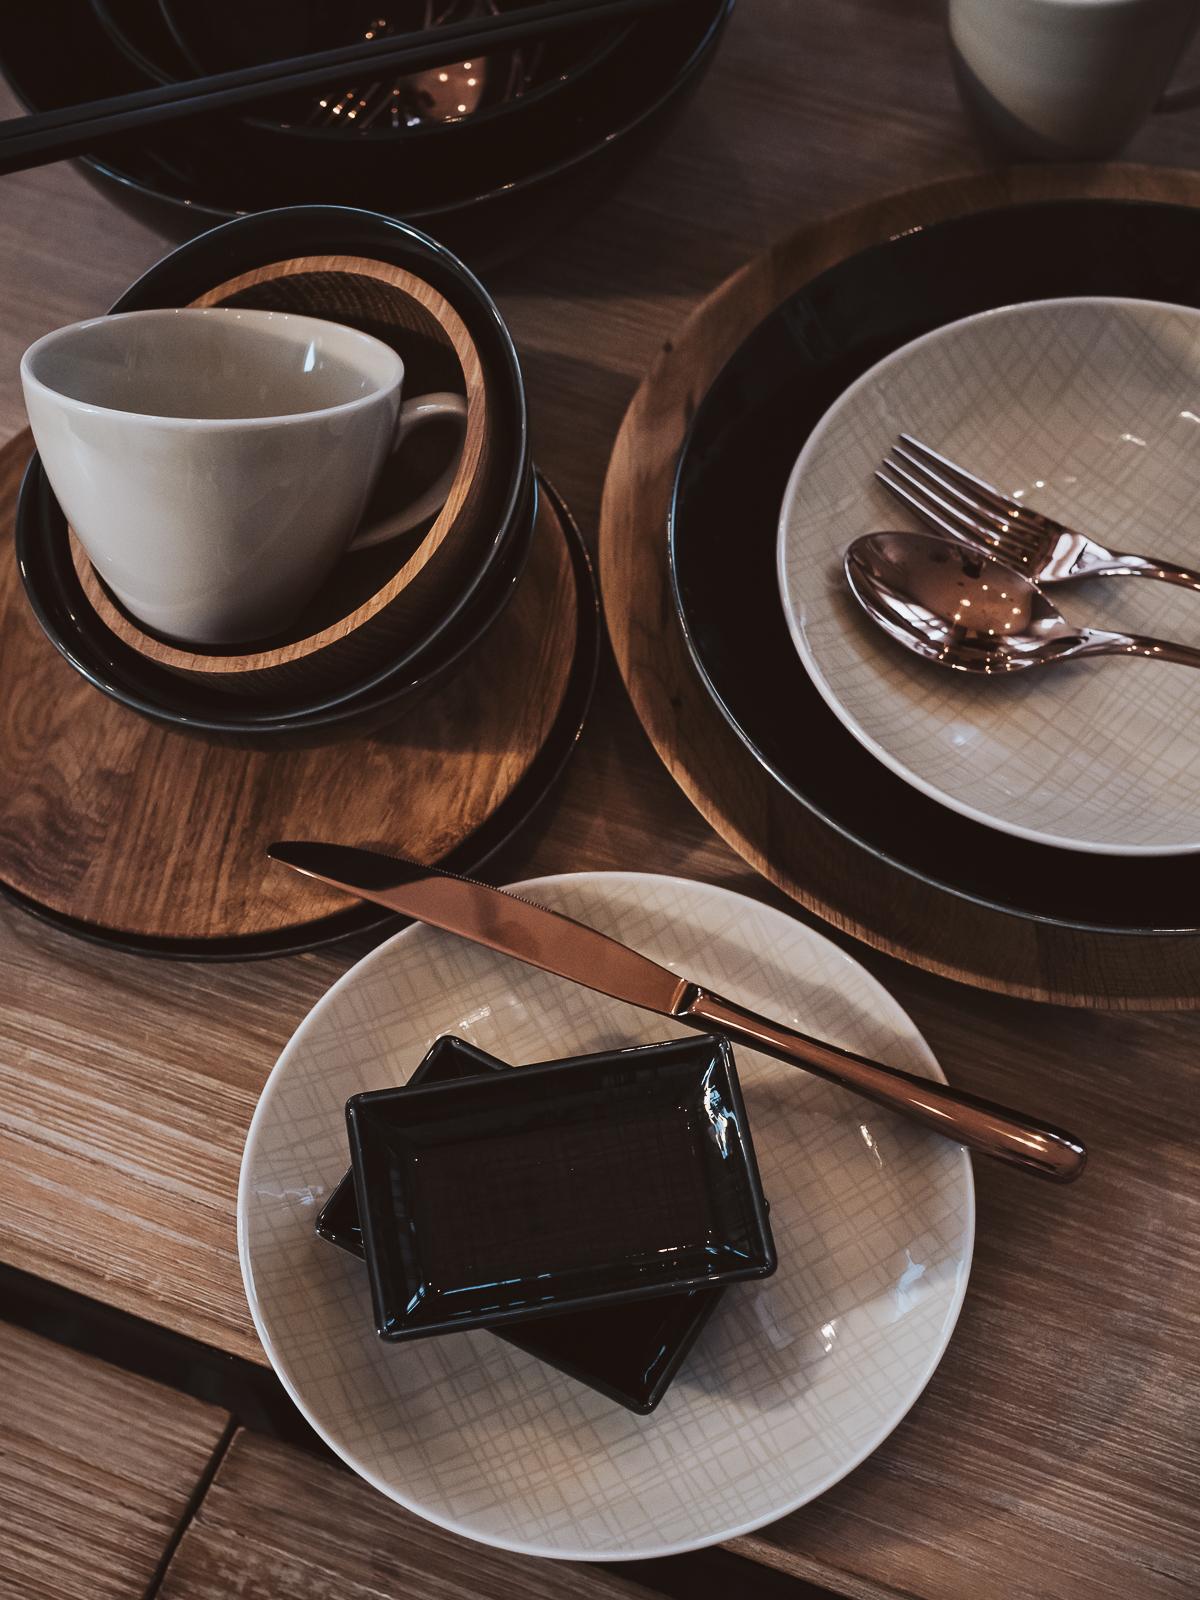 Ingolstadt Village Chinese New Year Lifestyle Shopping & Home Cooking - Olympus EM1Markii 2512 - Yes! Please Enjoy by Fanning Tseng-96.jpg